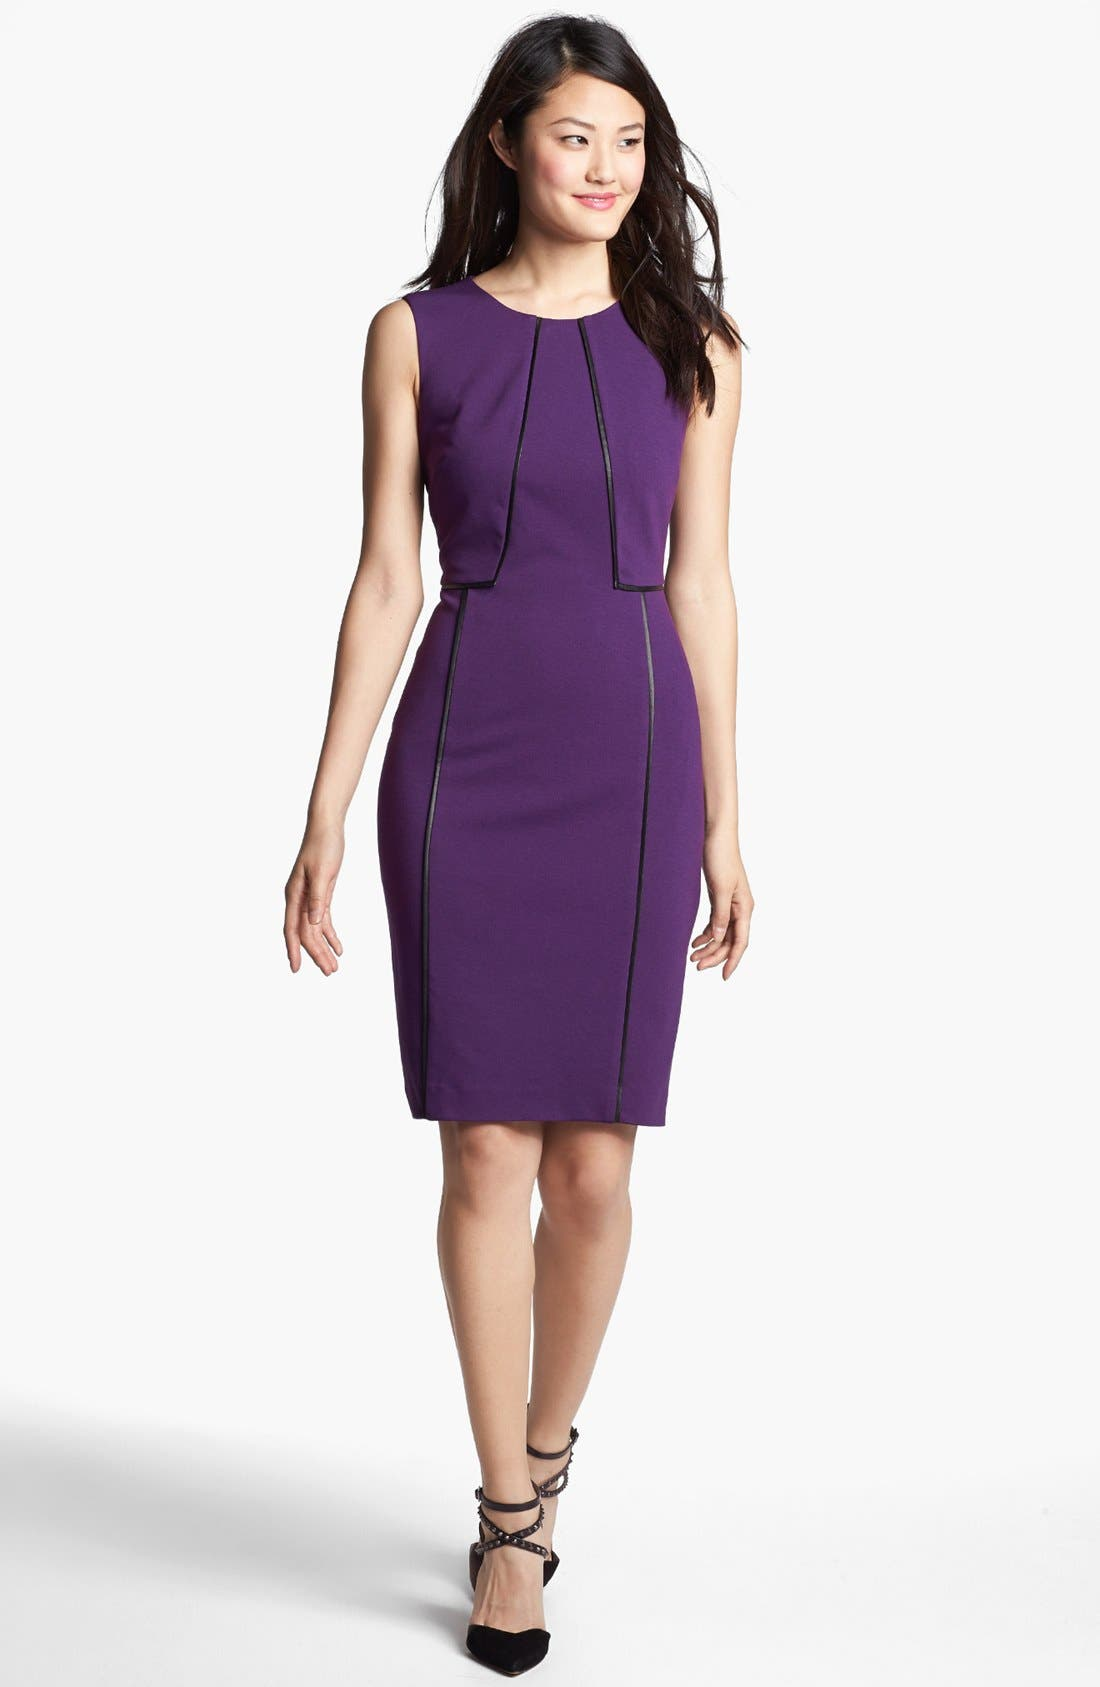 Main Image - Halogen® Faux Leather Trim Sheath Dress (Online Only)